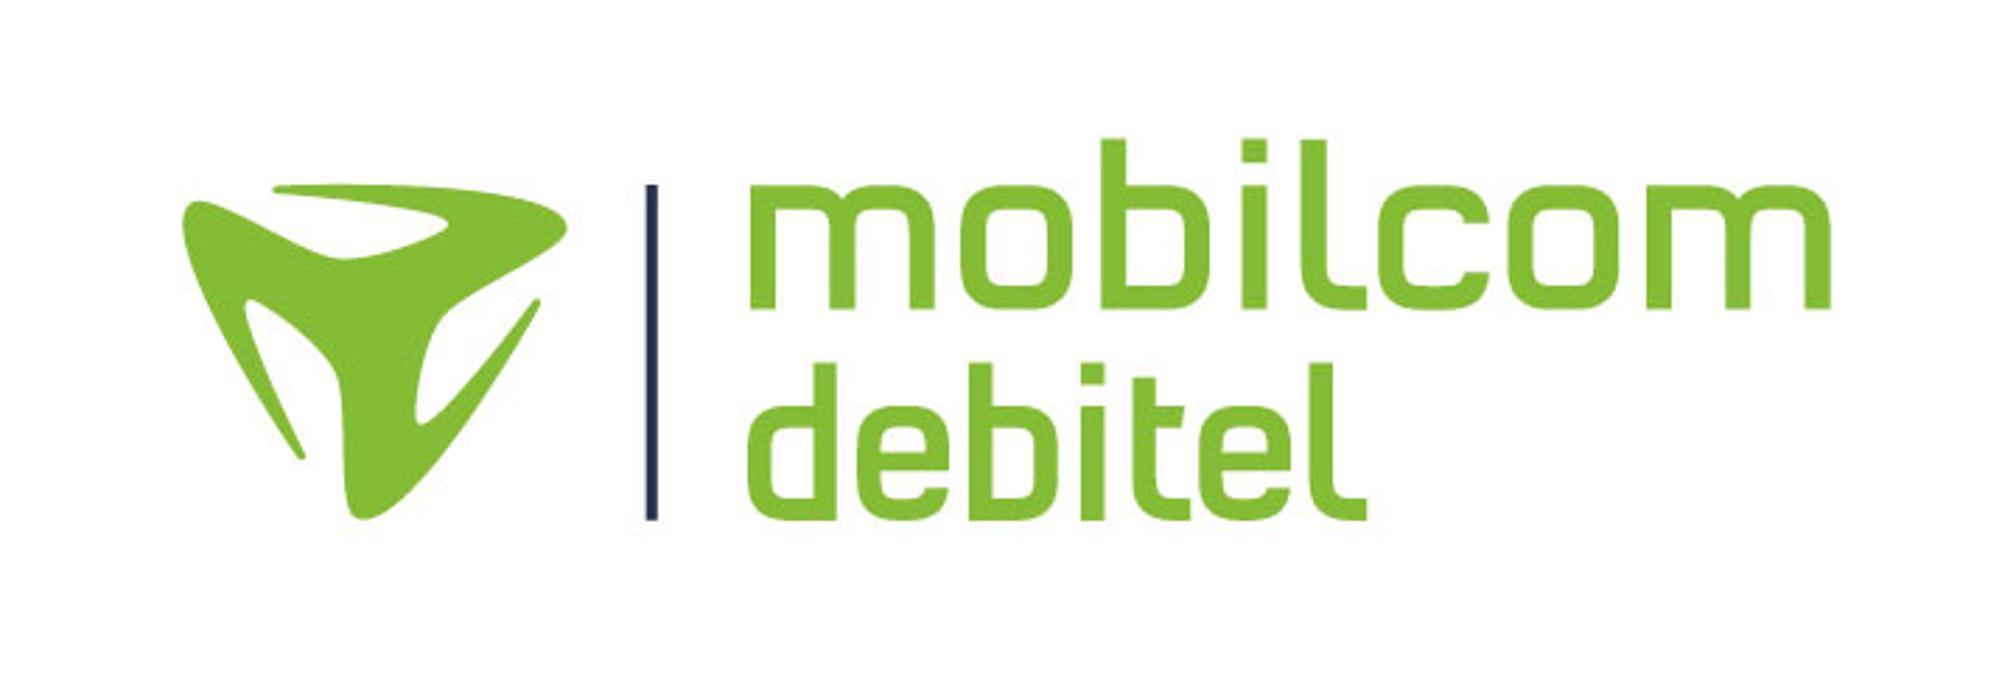 mobilcom-debitel, Stadthausstraße in Mainz